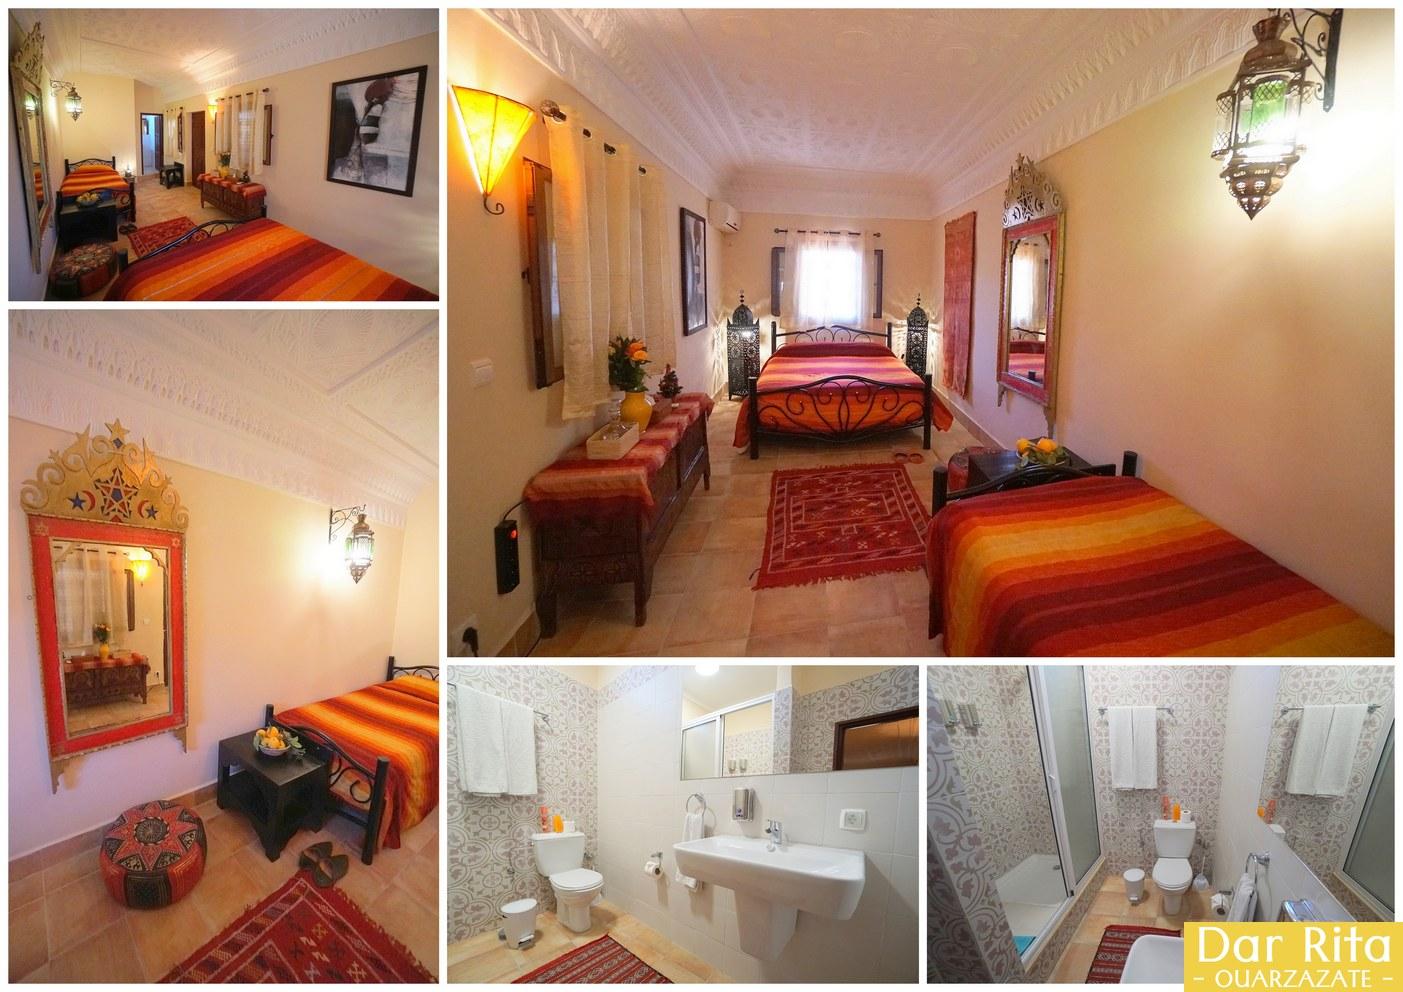 Hotel Ouarzazate Dar Rita